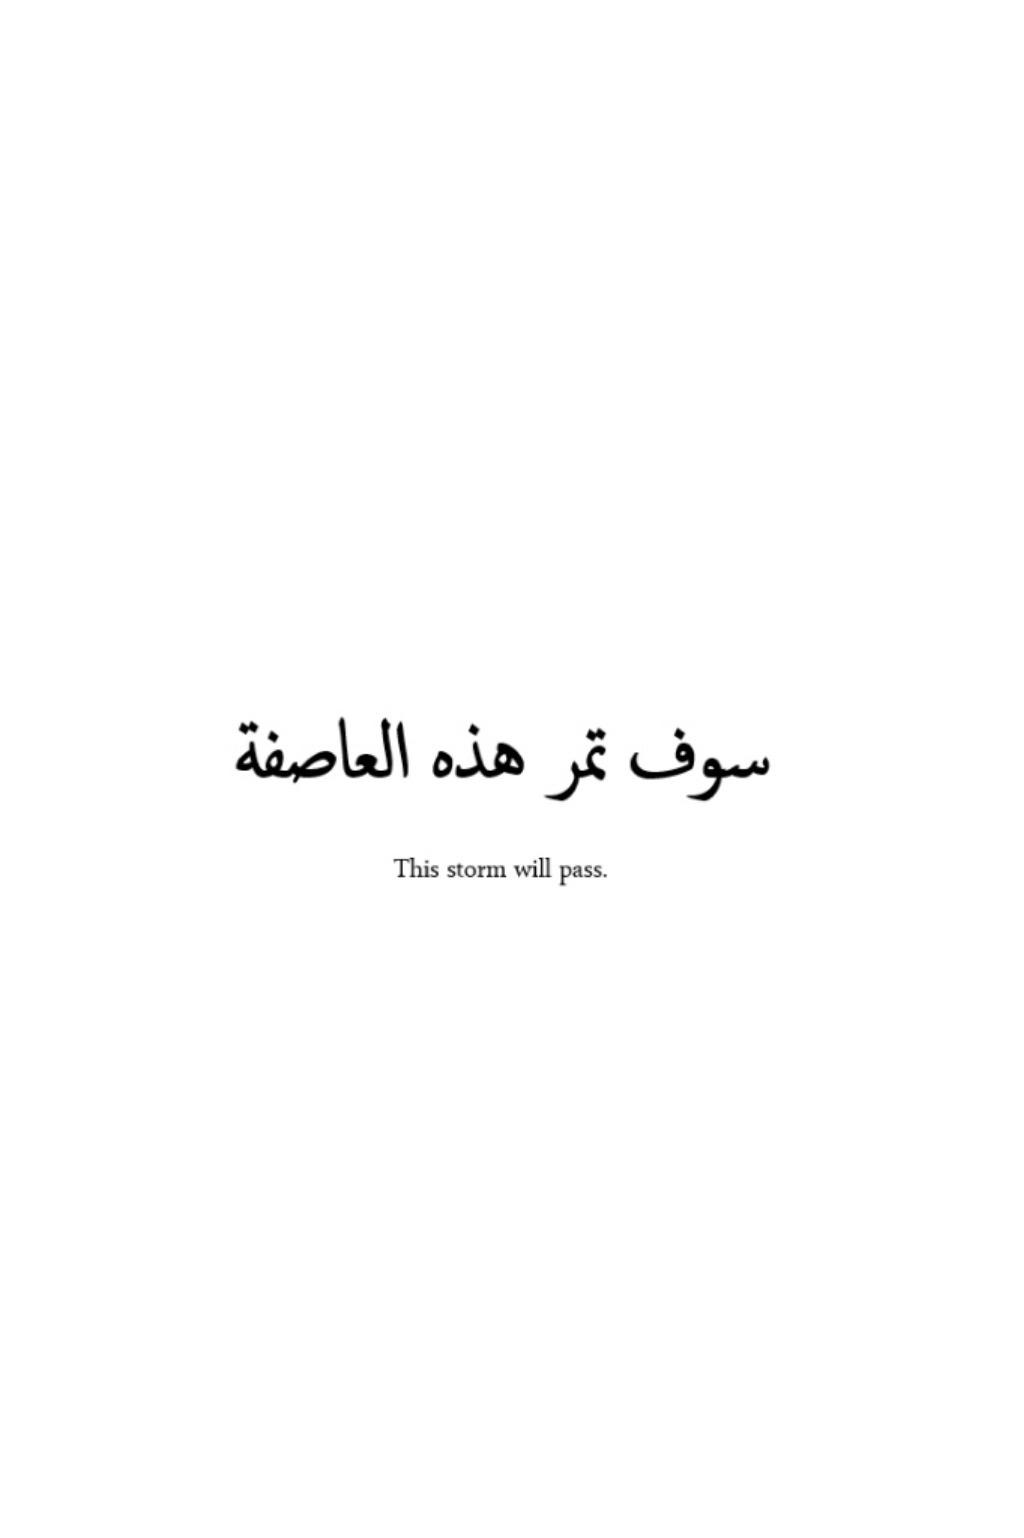 unique arabic love quotes tumblr thousands of inspiration quotes